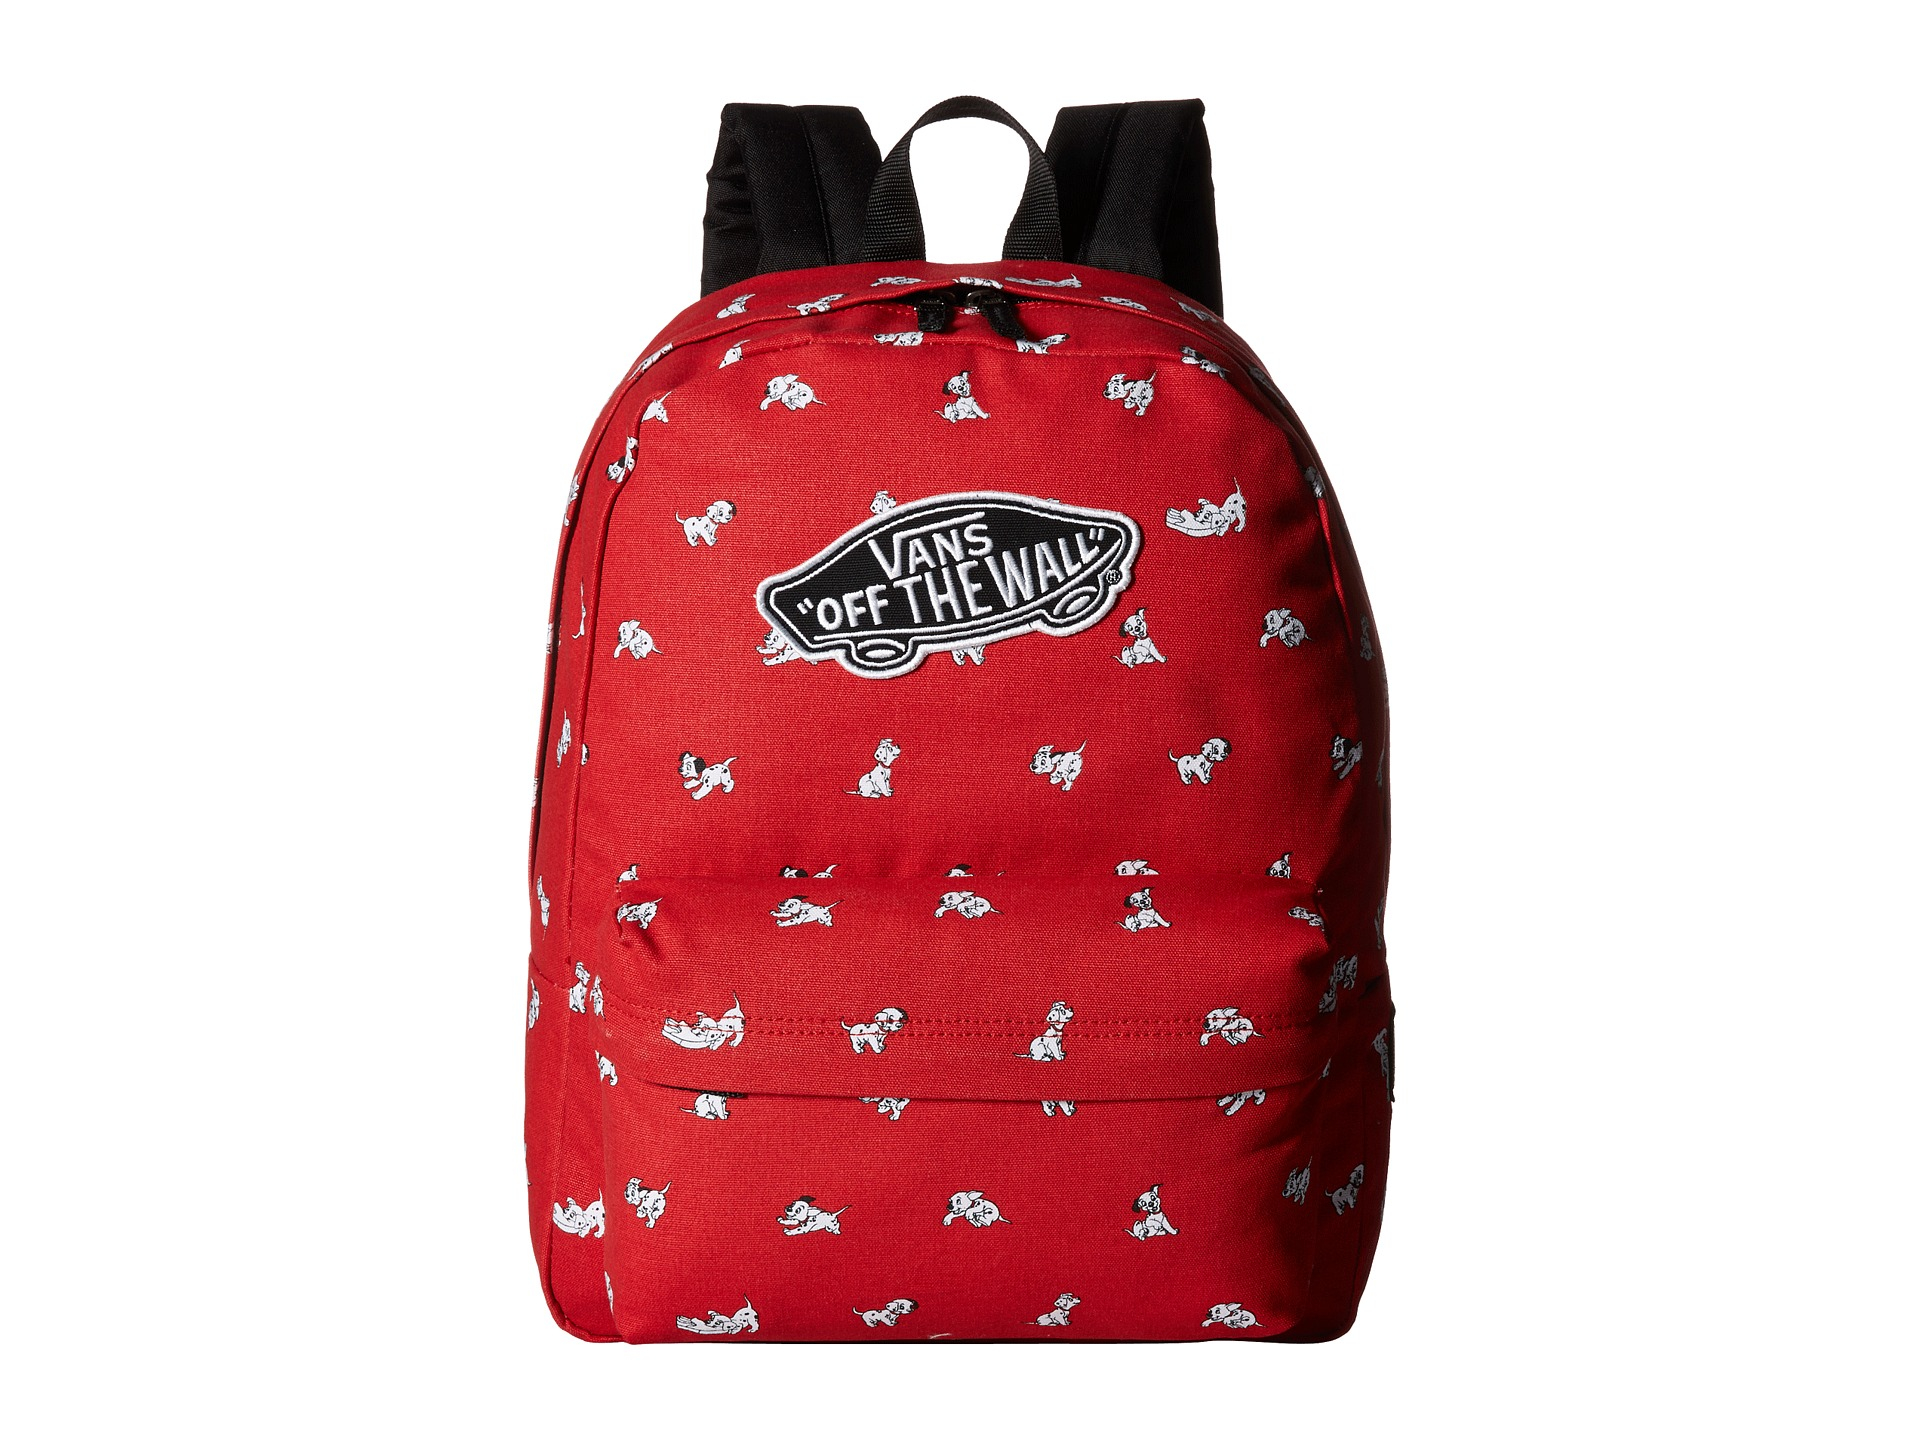 56e711dc61 Lyst - Vans Disney Backpack in Red